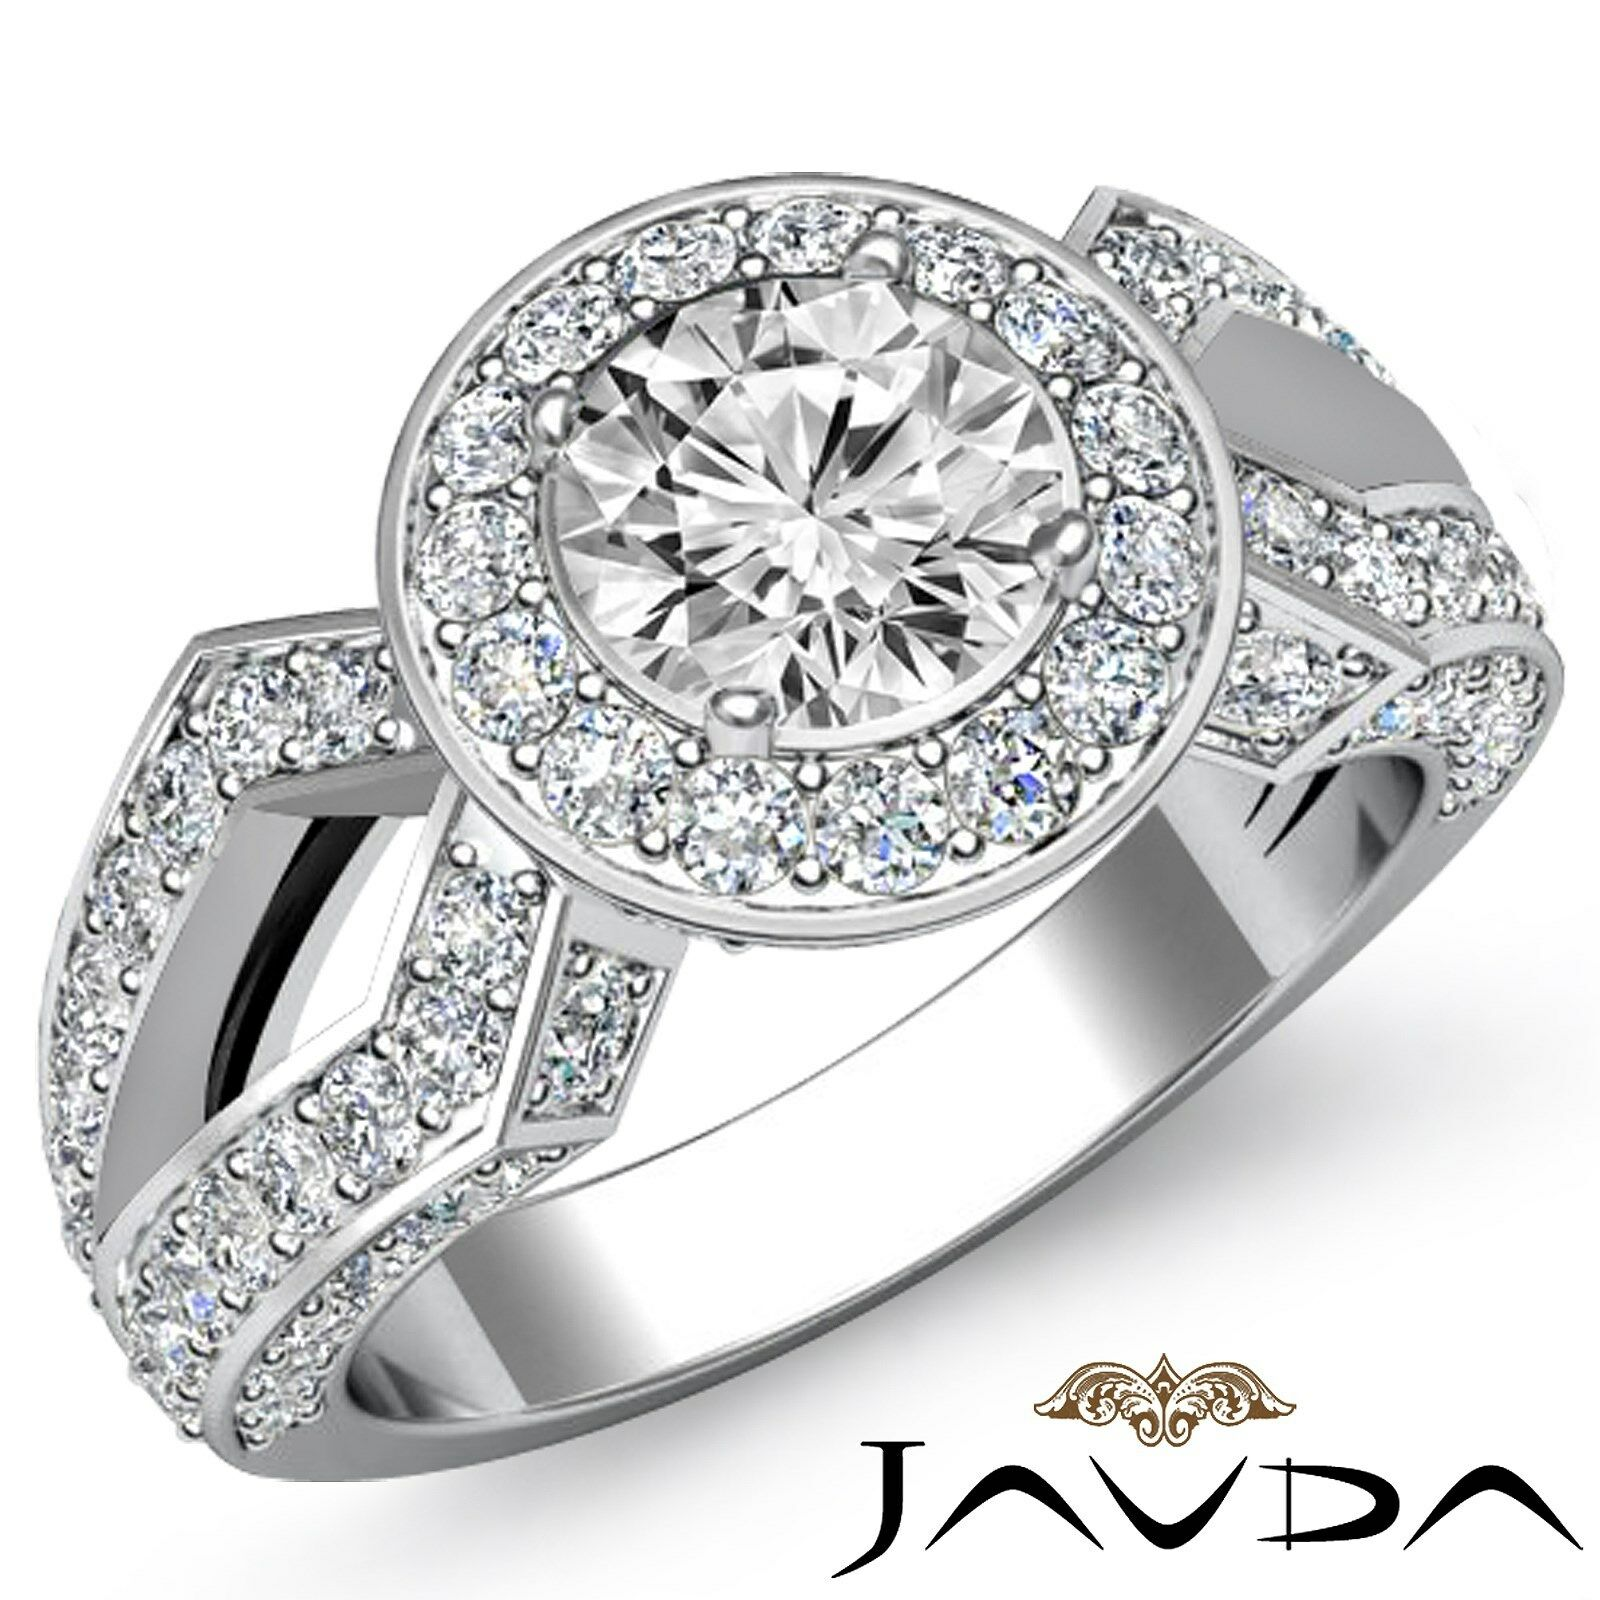 Split Shank Pave Set Halo Women's Round Diamond Engagement Ring GIA H VS1 2.92Ct